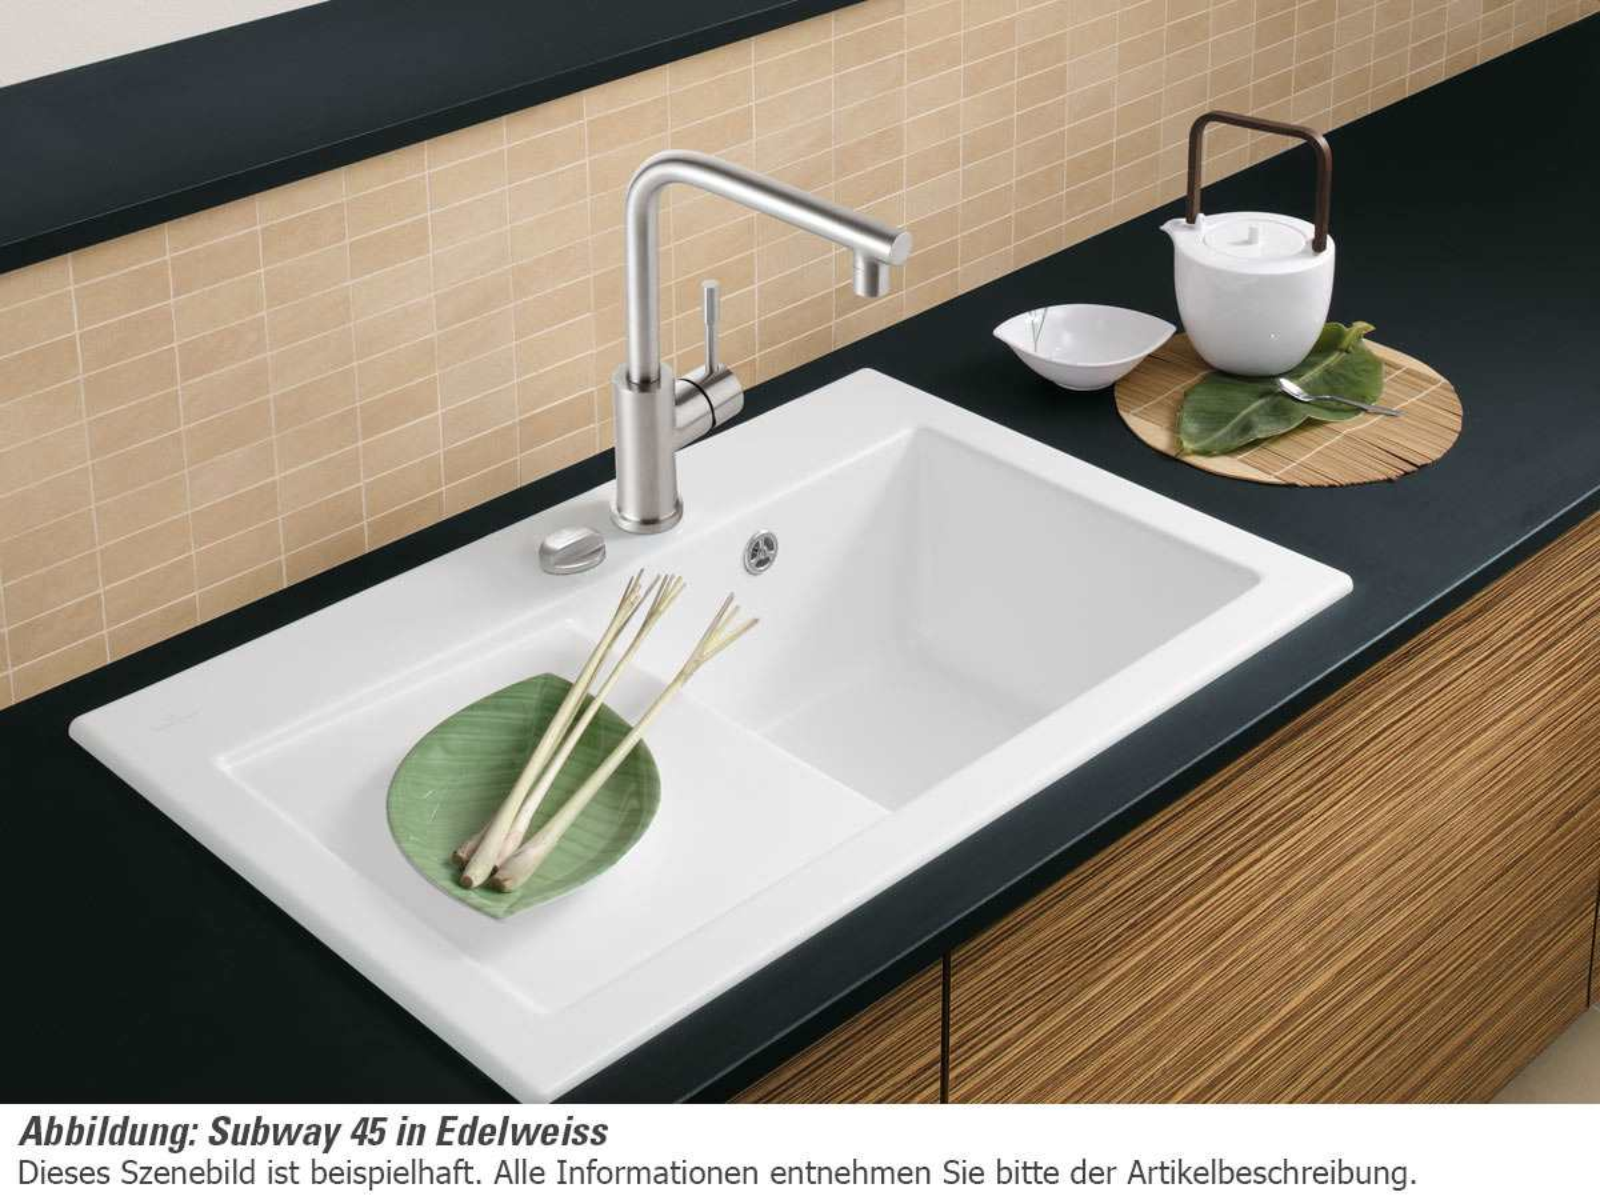 Villeroy & Boch Subway 45 Edelweiss - 6714 02 S3 Keramikspüle Exzenterbetätigung